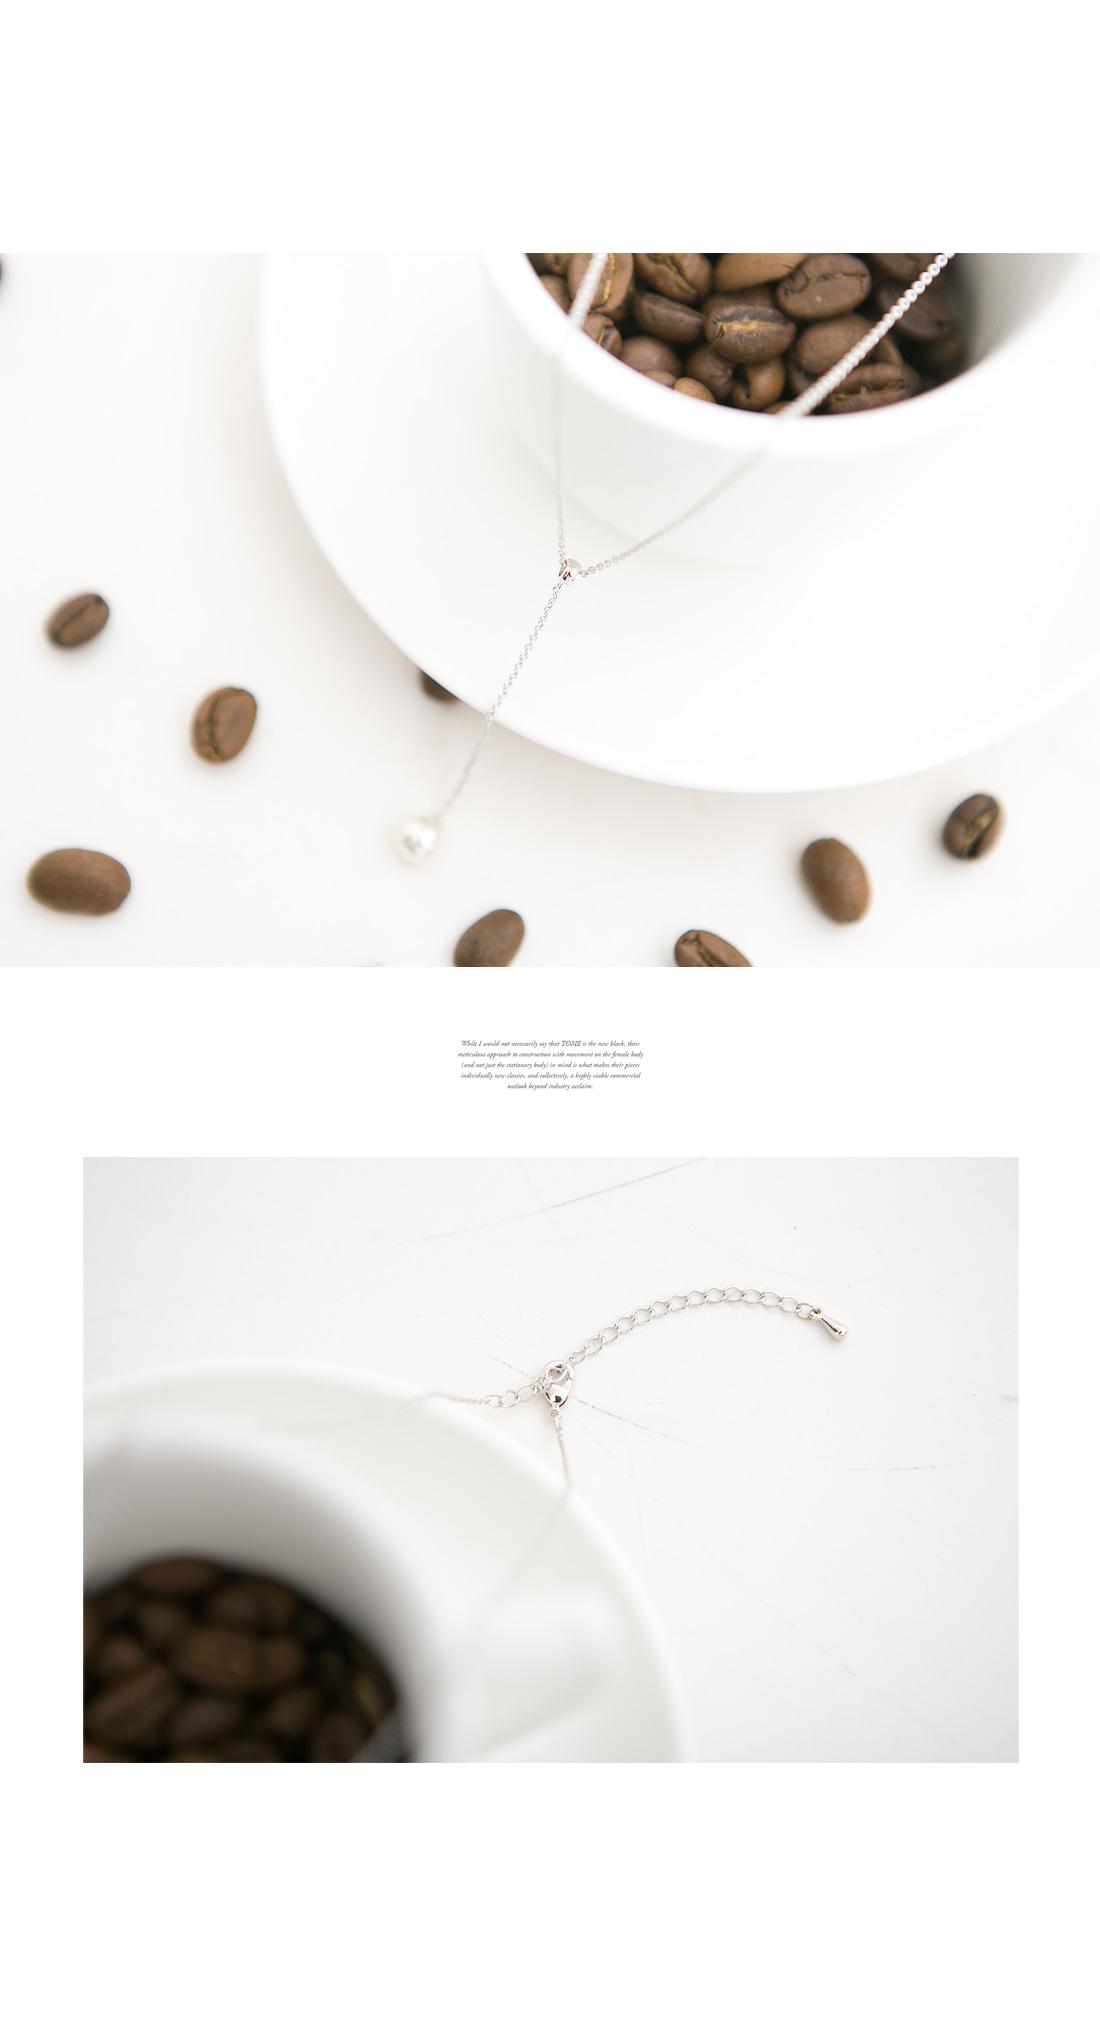 Lizard Pearl Necklace #84455